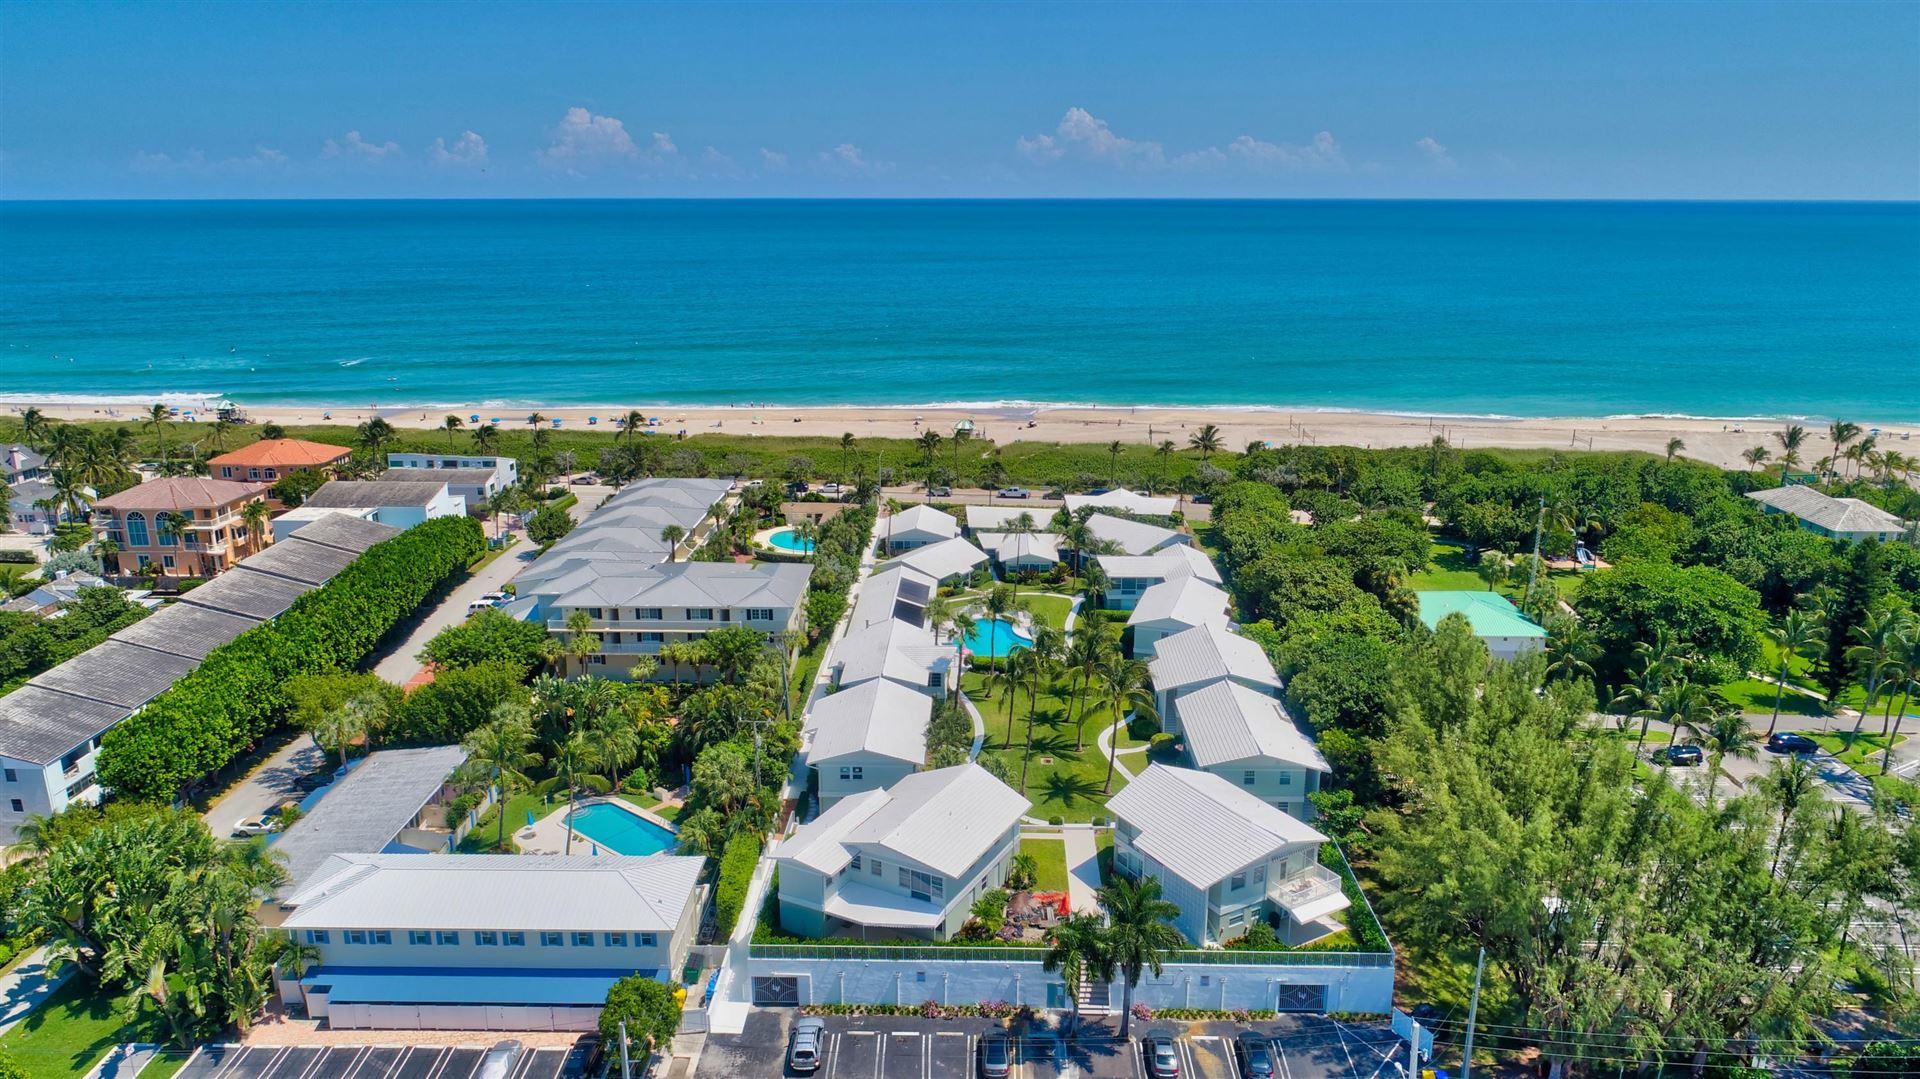 320 S Ocean Boulevard #V-E, Delray Beach, FL 33483 - #: RX-10704783